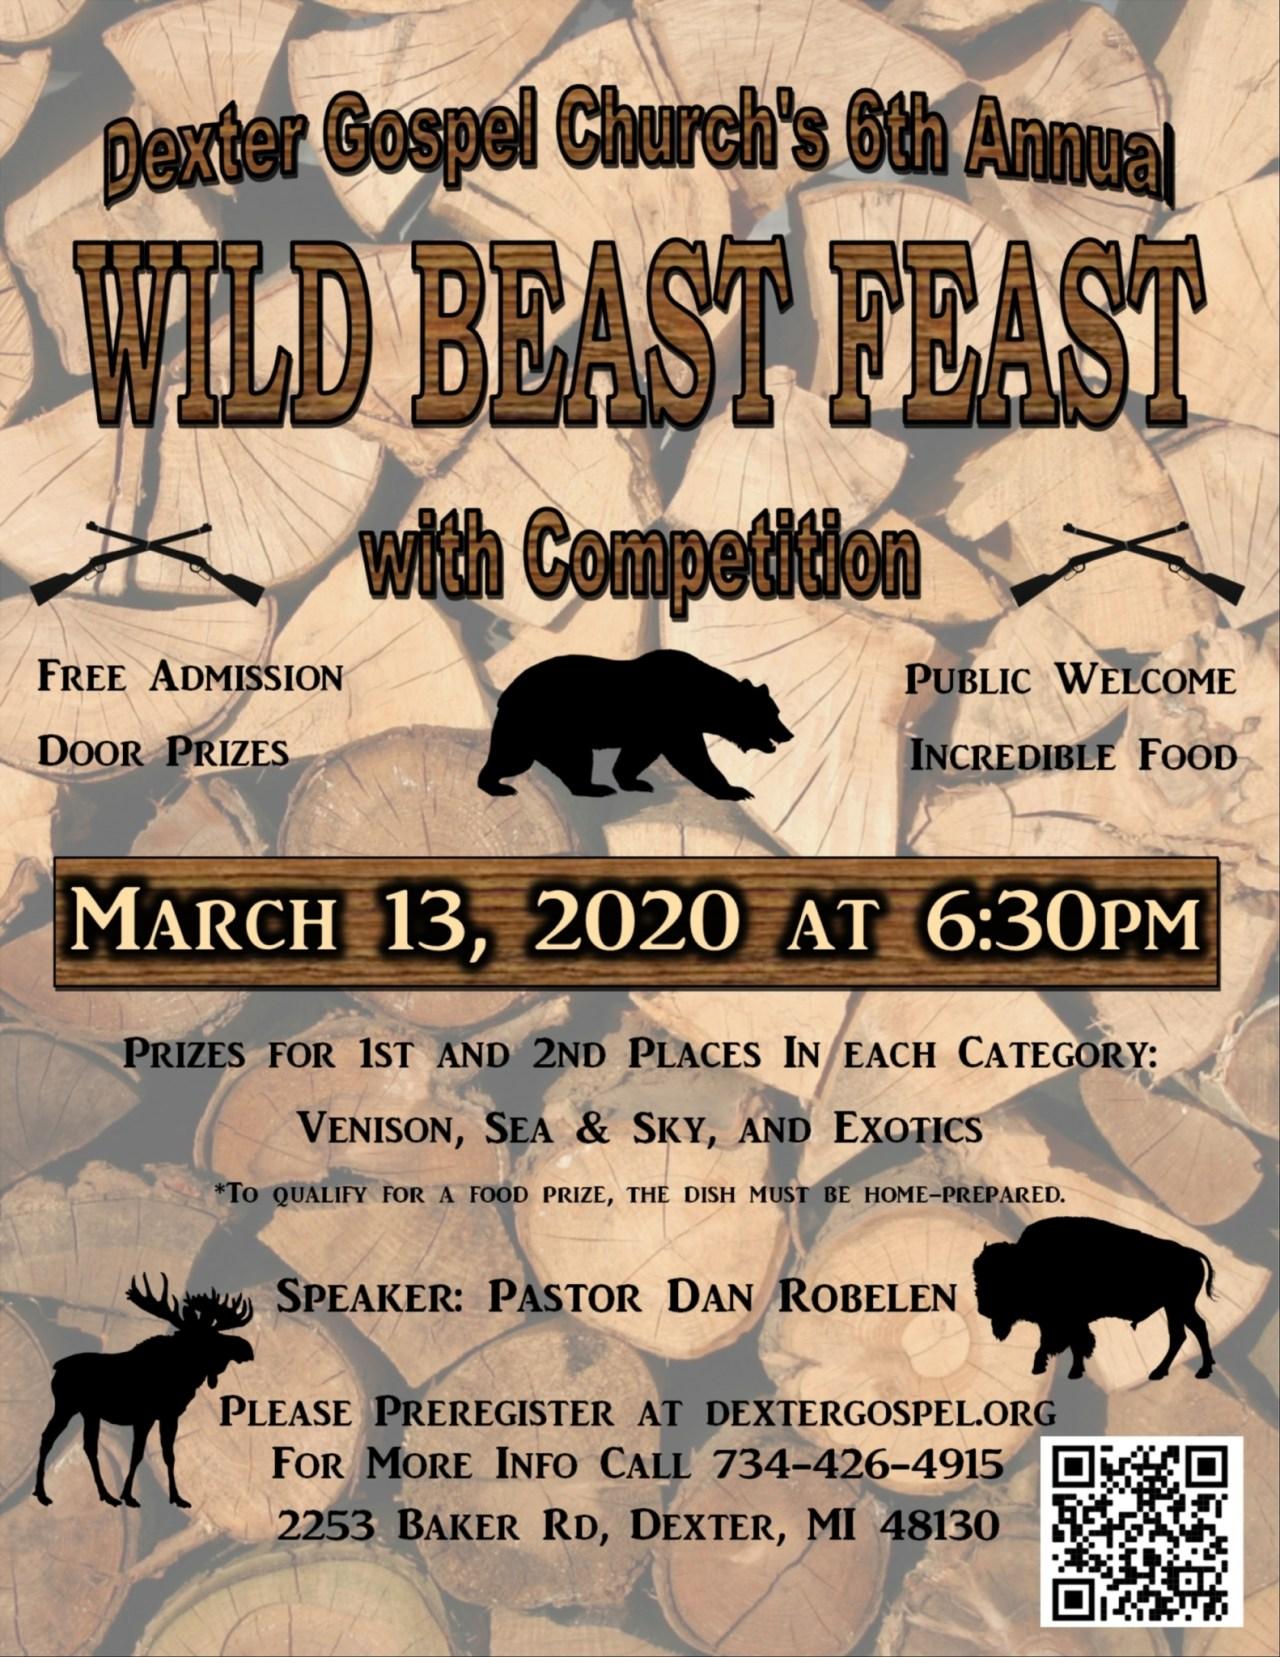 Wild Beast Feast 2020